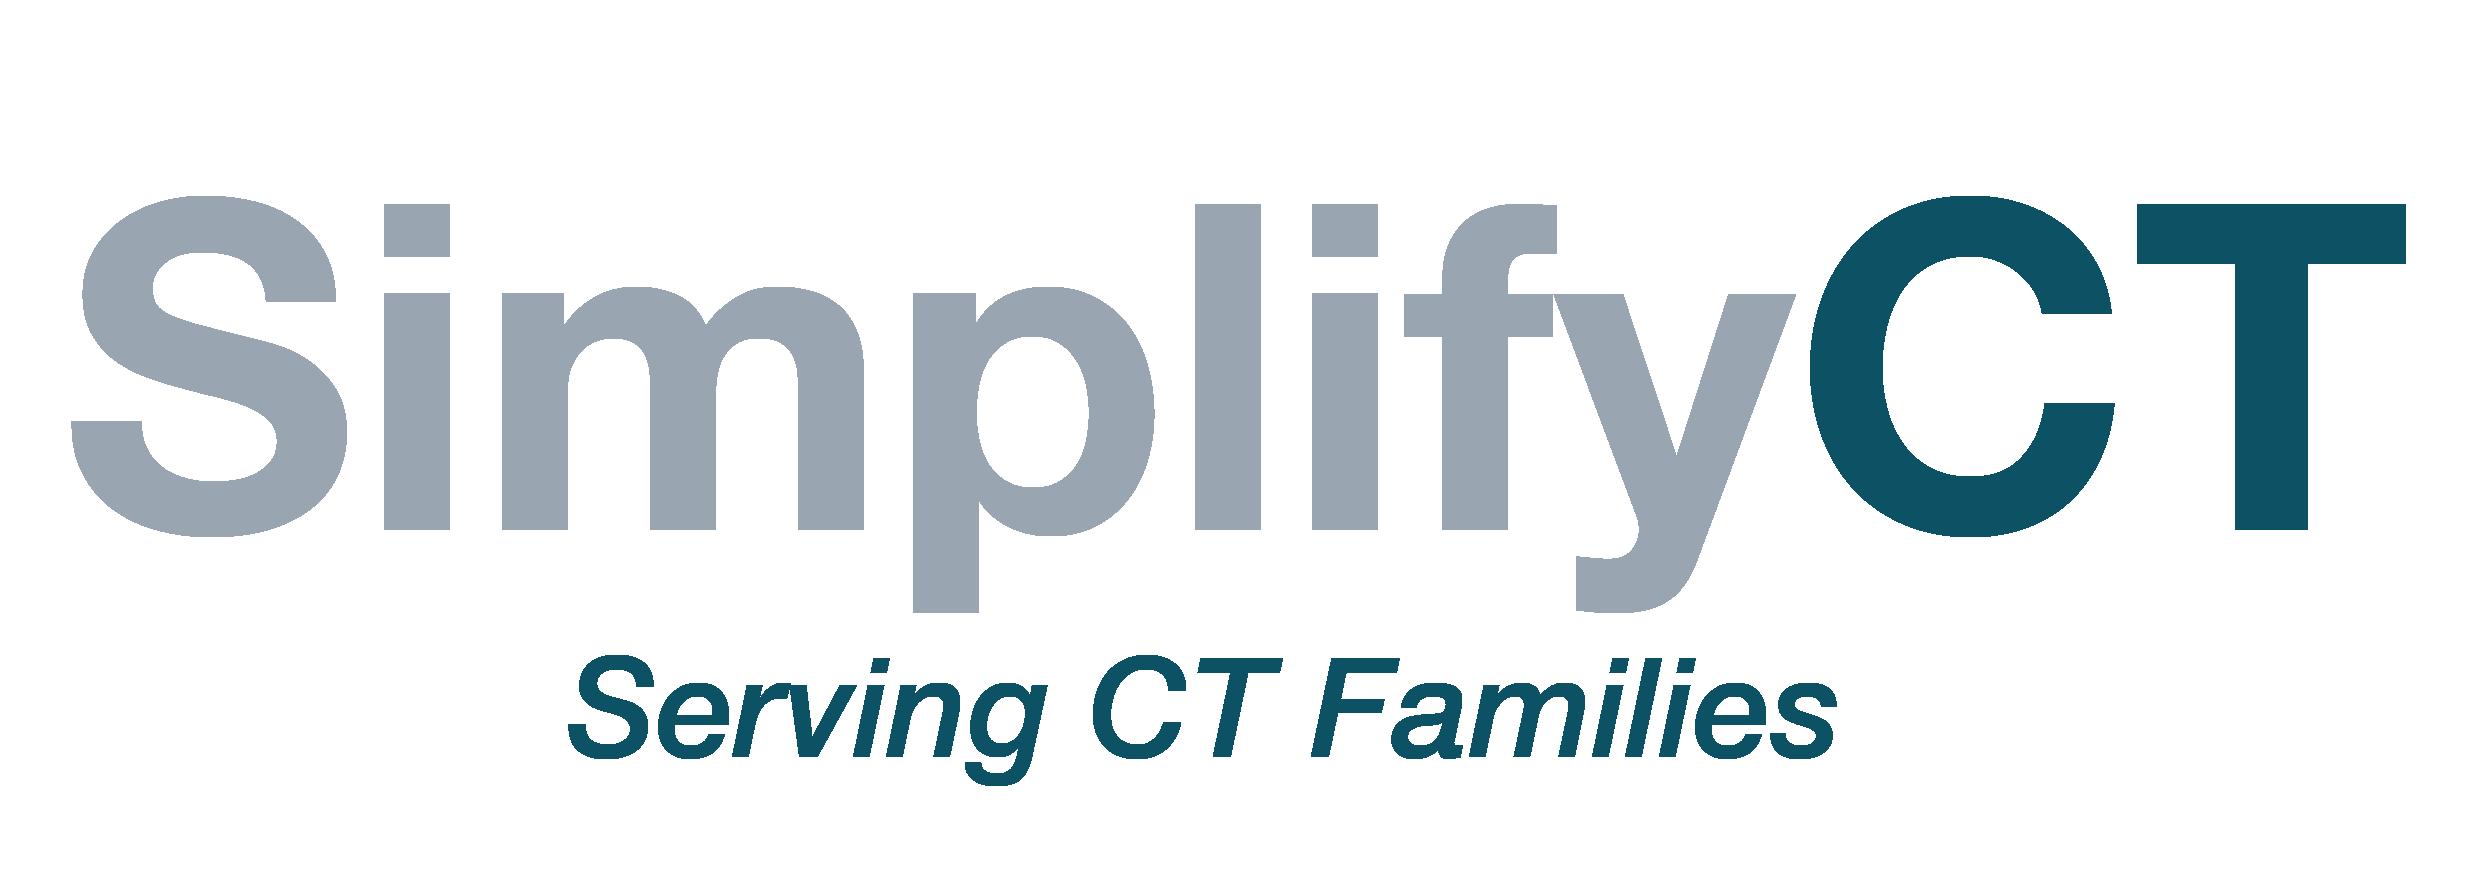 Simplify CT logo